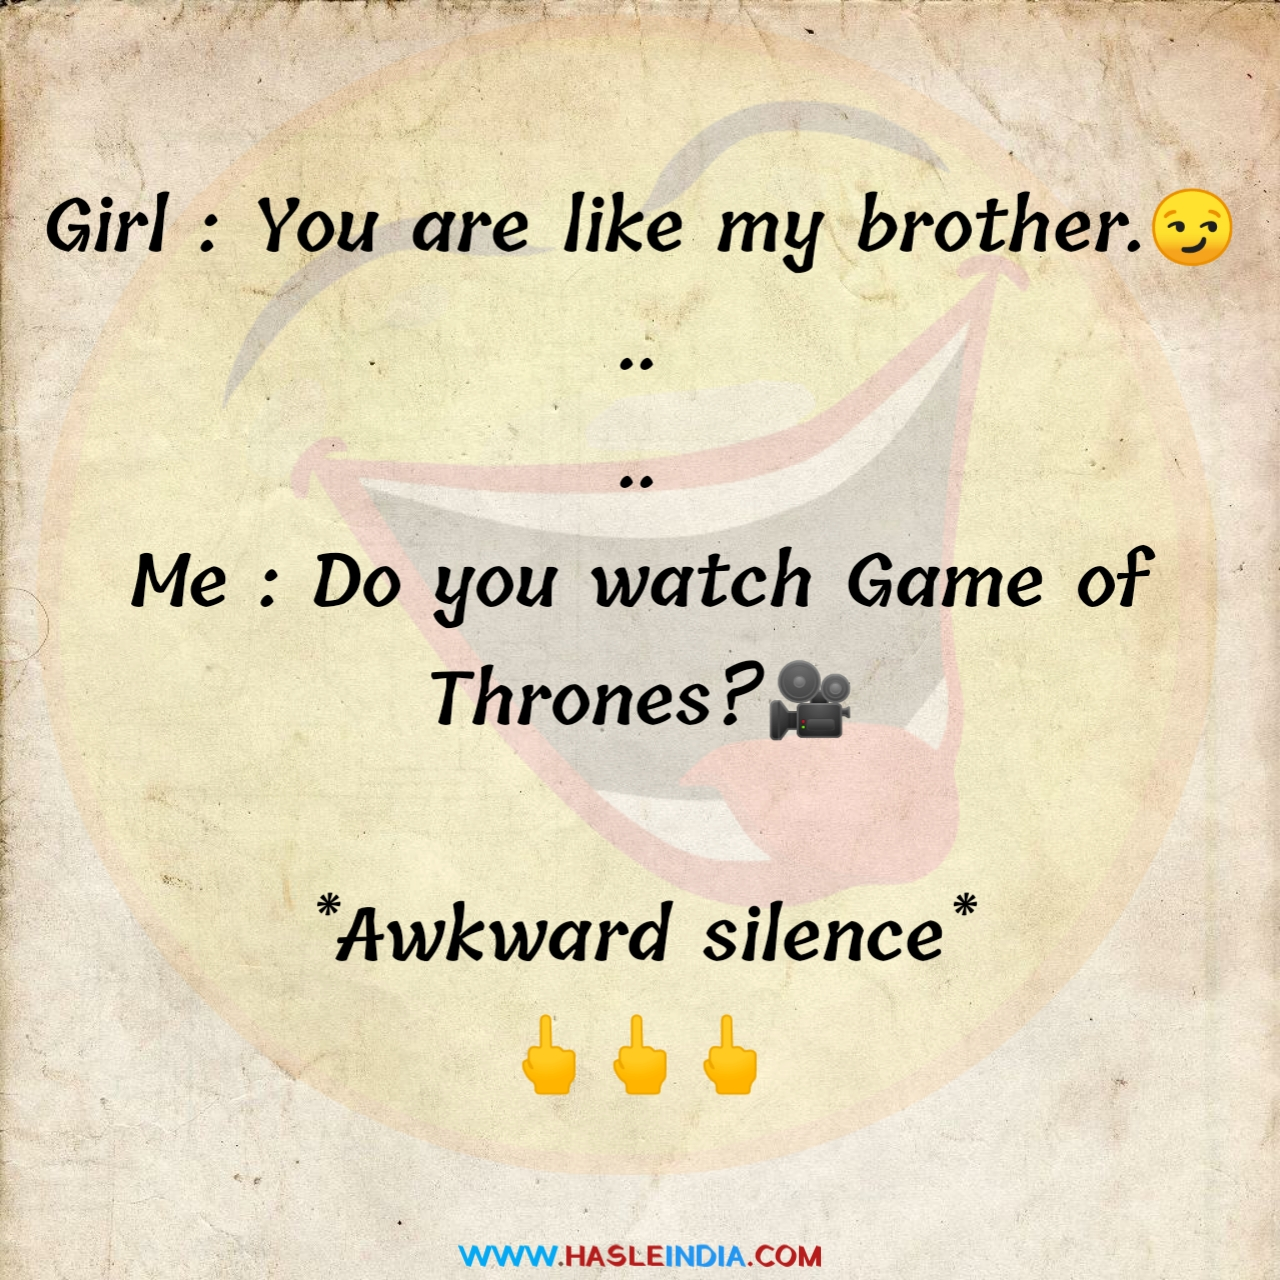 funny hindi jokes,Hasle india,hindi chutkule,hindi joke sms,Hindi jokes,hindi jokes images,hindi jokes pic,jokes in hindi,